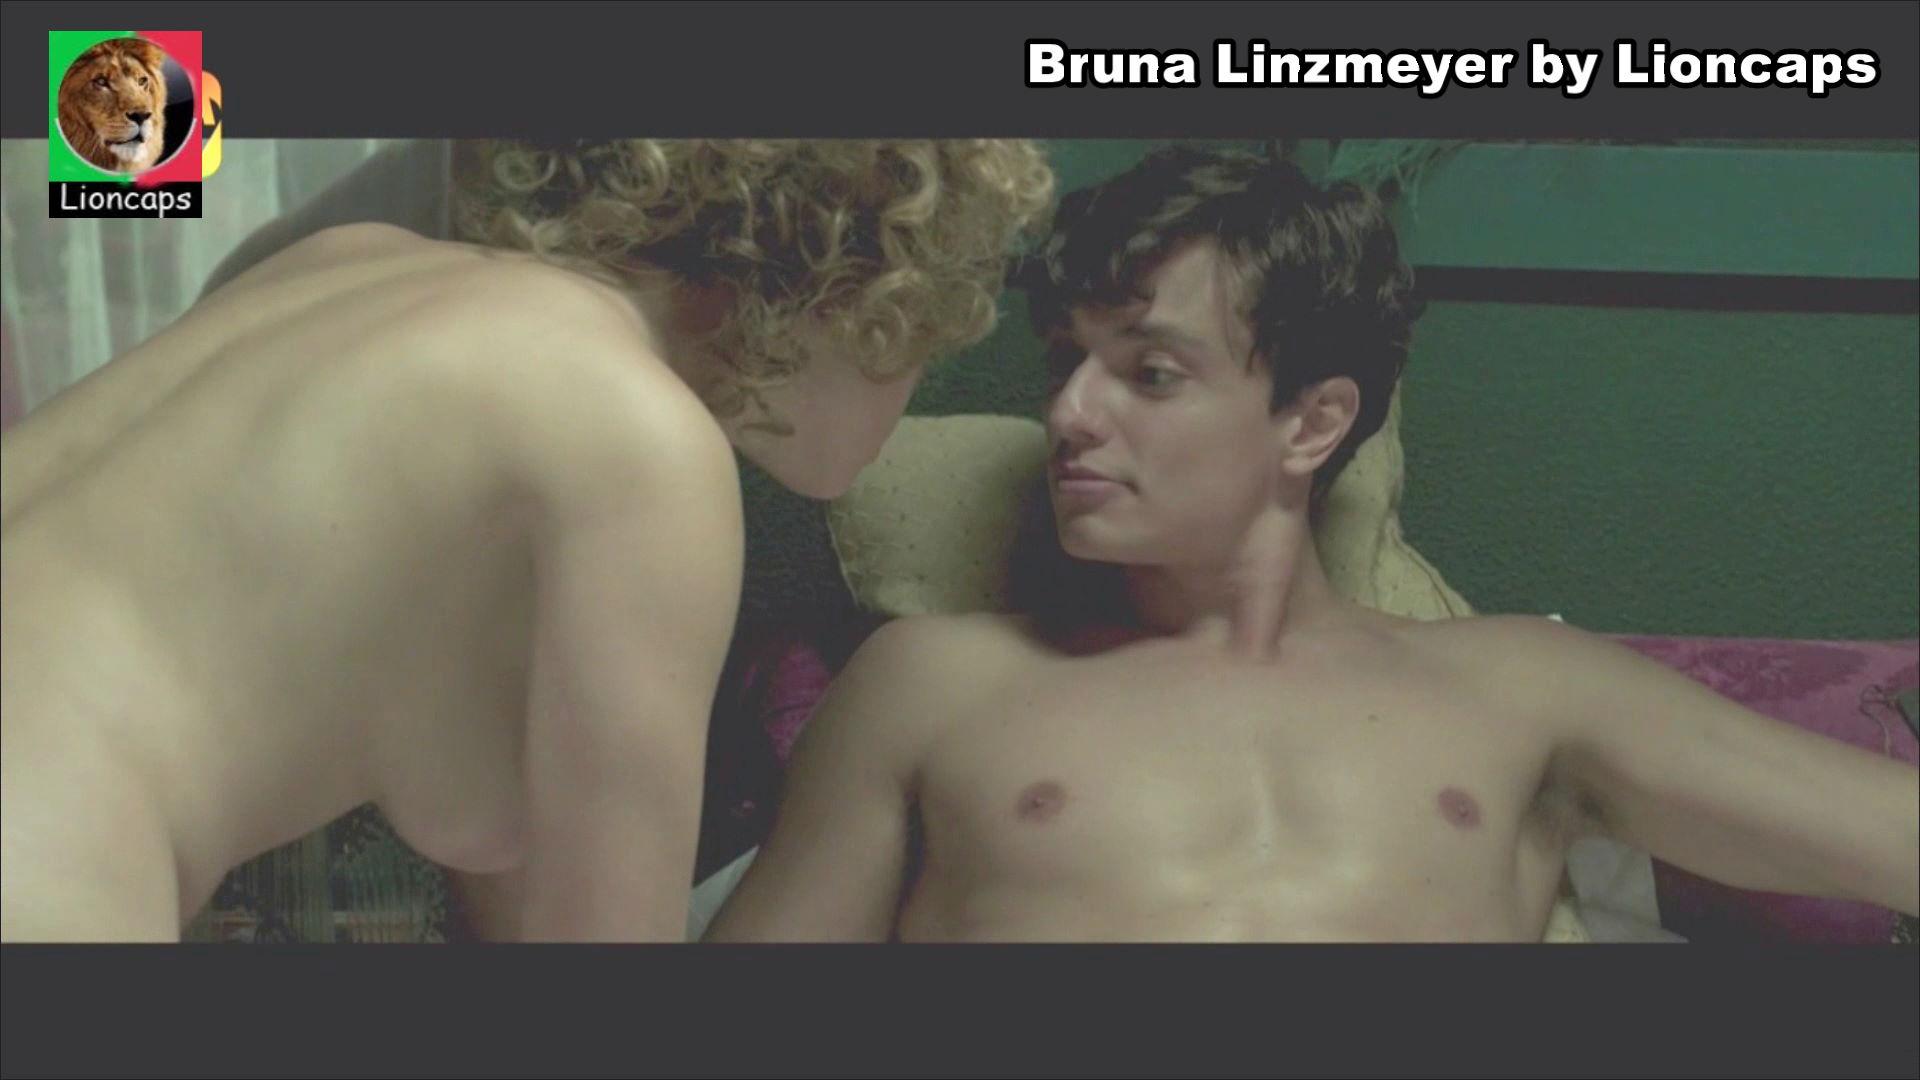 326871835_bruna_linzmeyer_circo_vs190901_0017_123_259lo.JPG